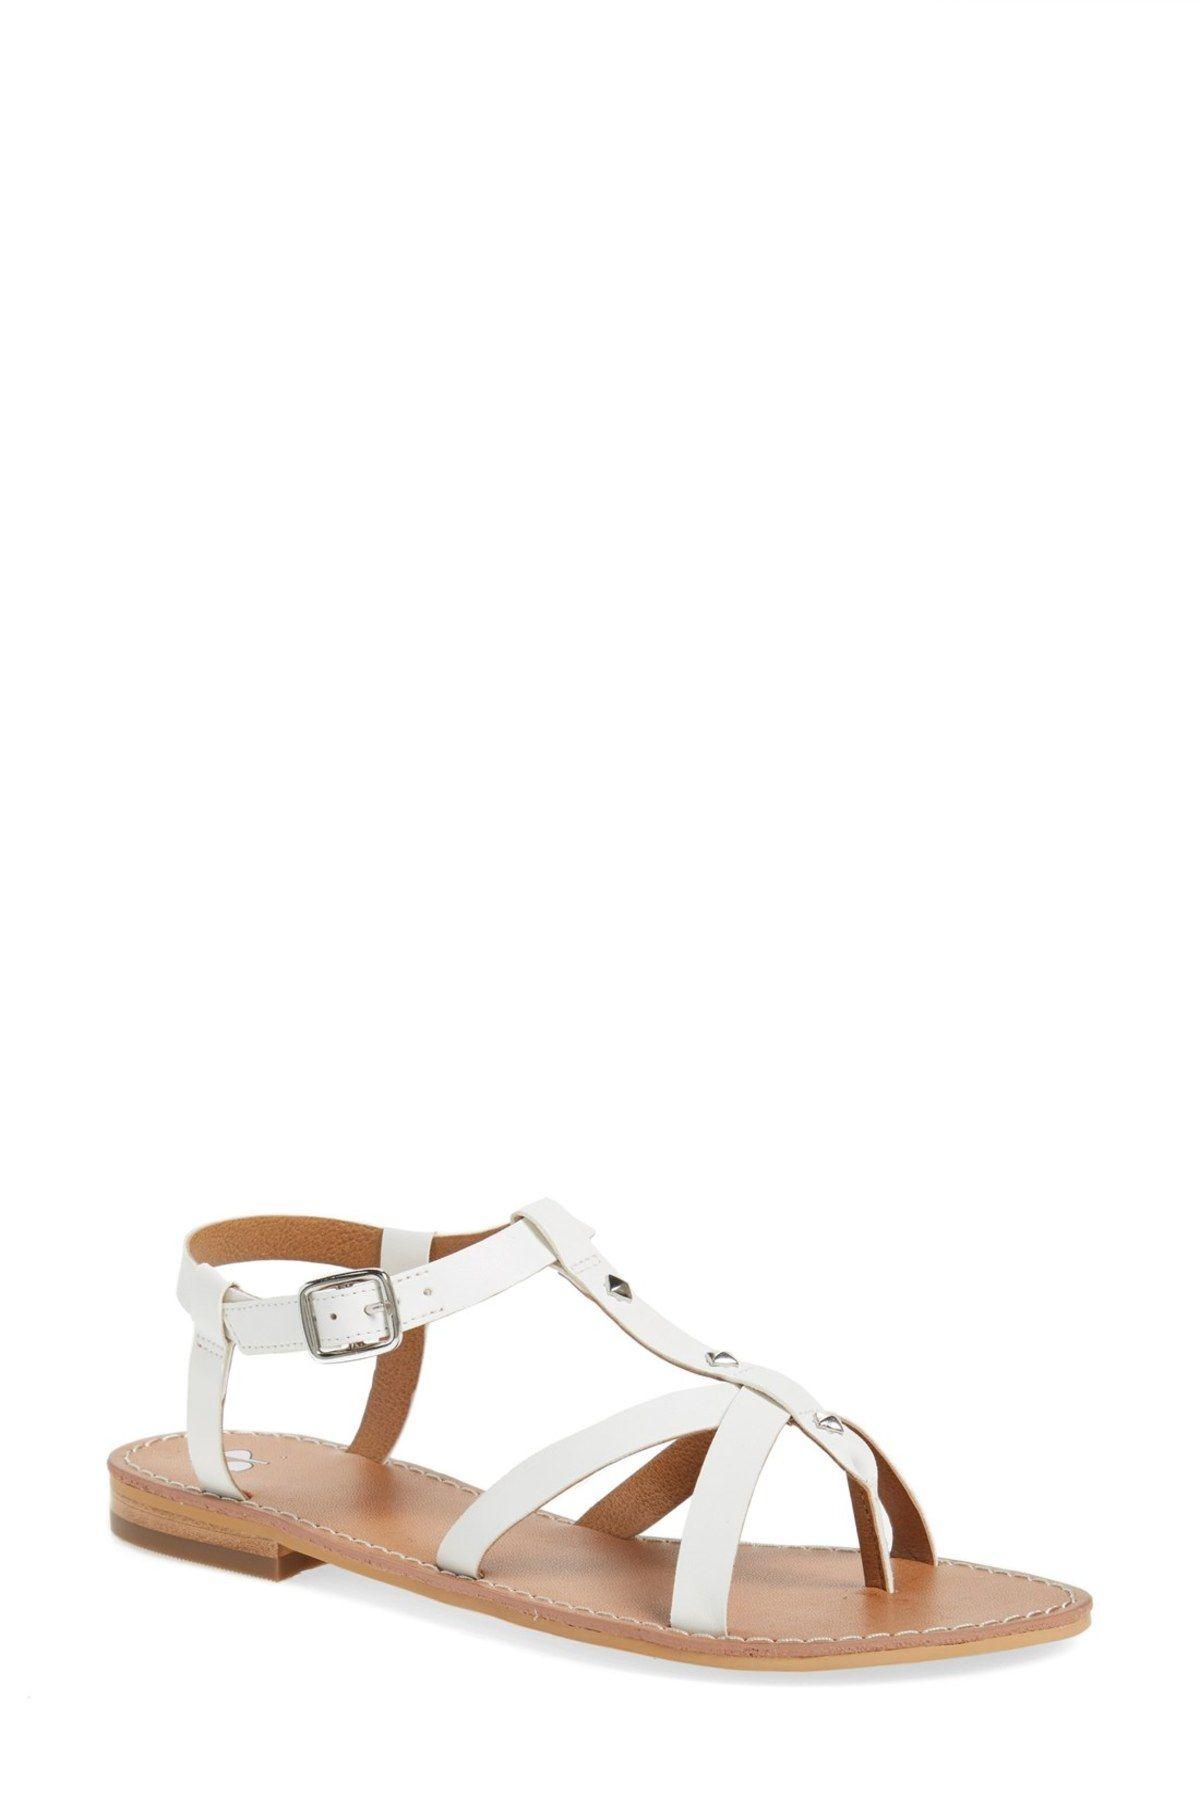 'Sadie' Sandal